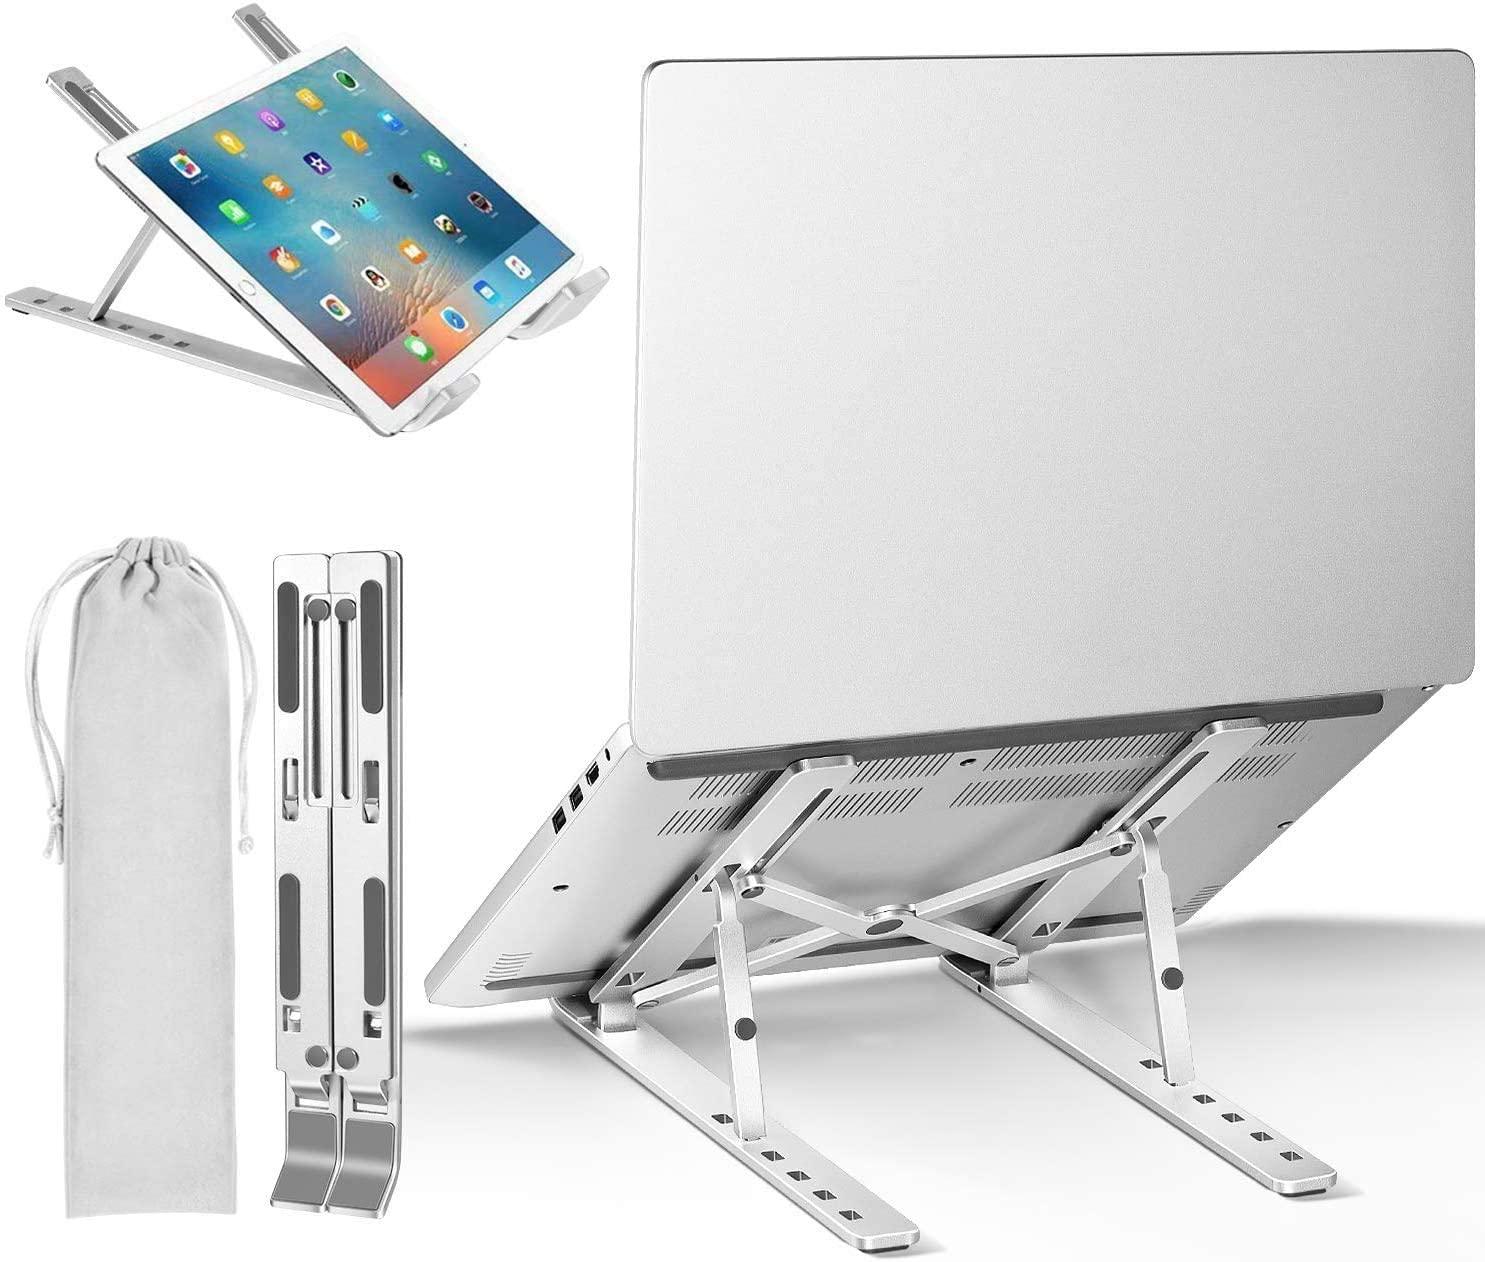 Portátil portátil de aluminio plegable Macbook Pro soporte ajustable Notebook titular Tablet Base para PC accesorios de la computadora